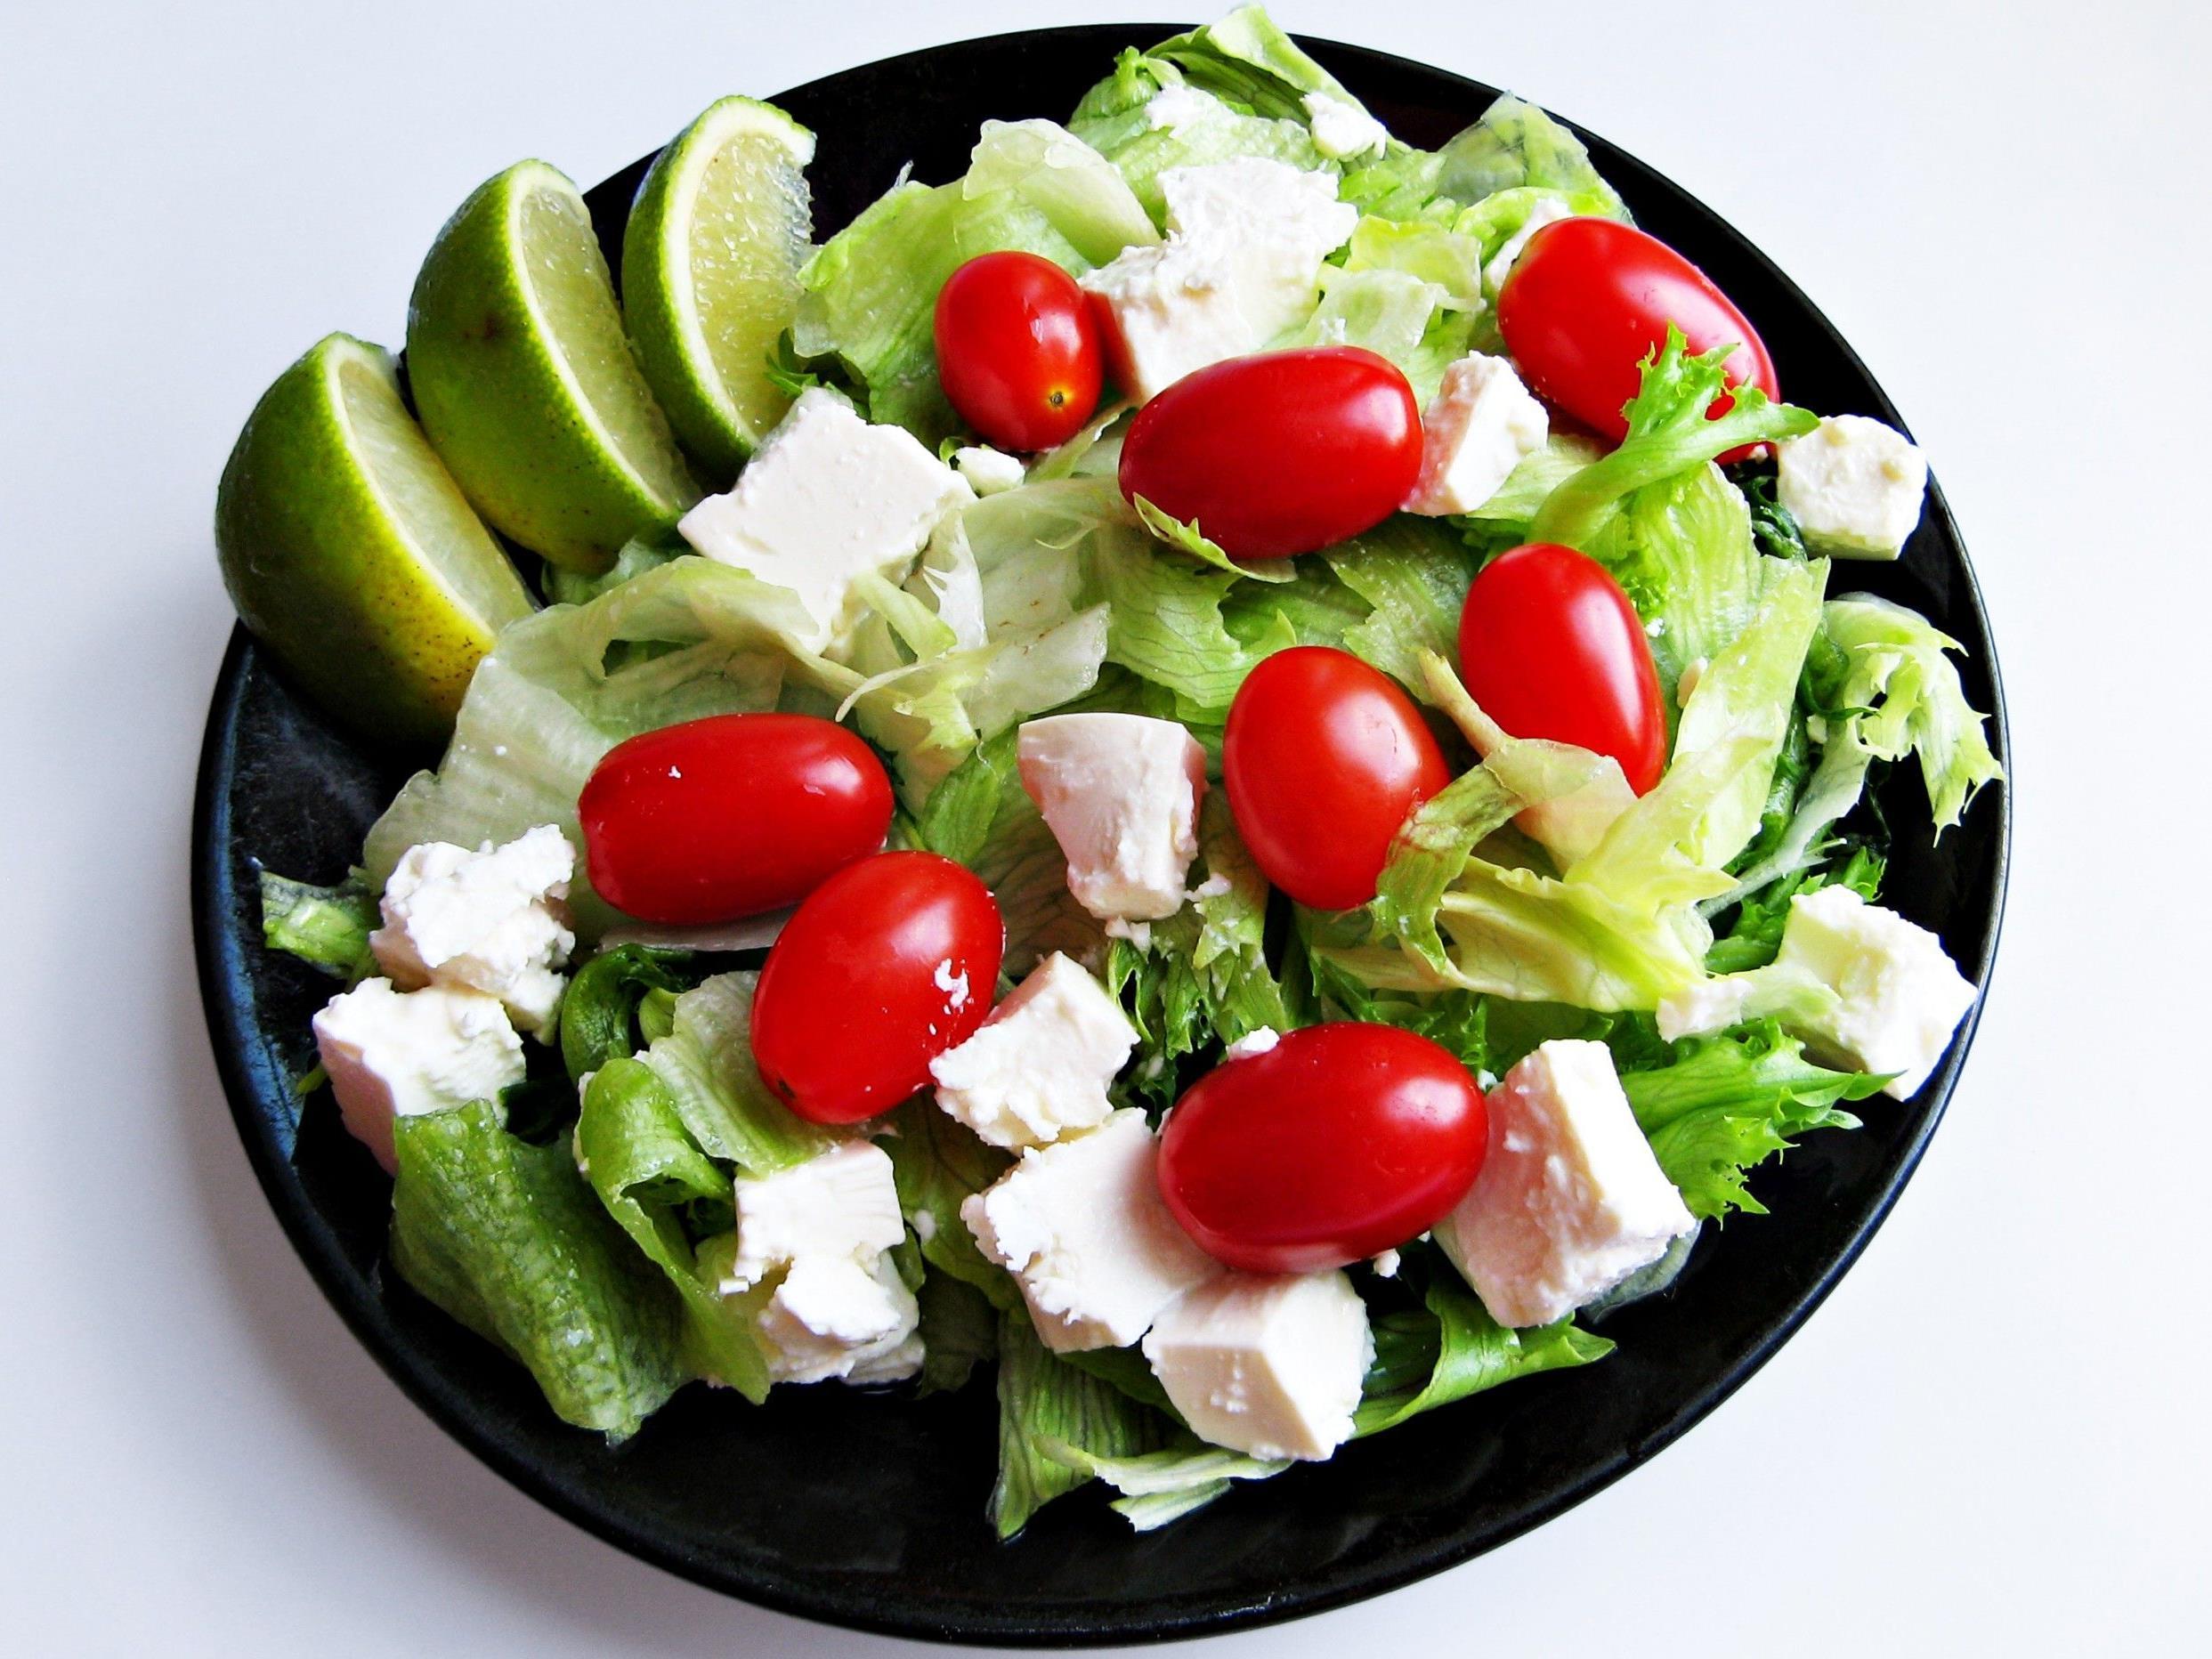 Statt dem Griff zum Fertigprodukt rät die AK zu frischem Salat.